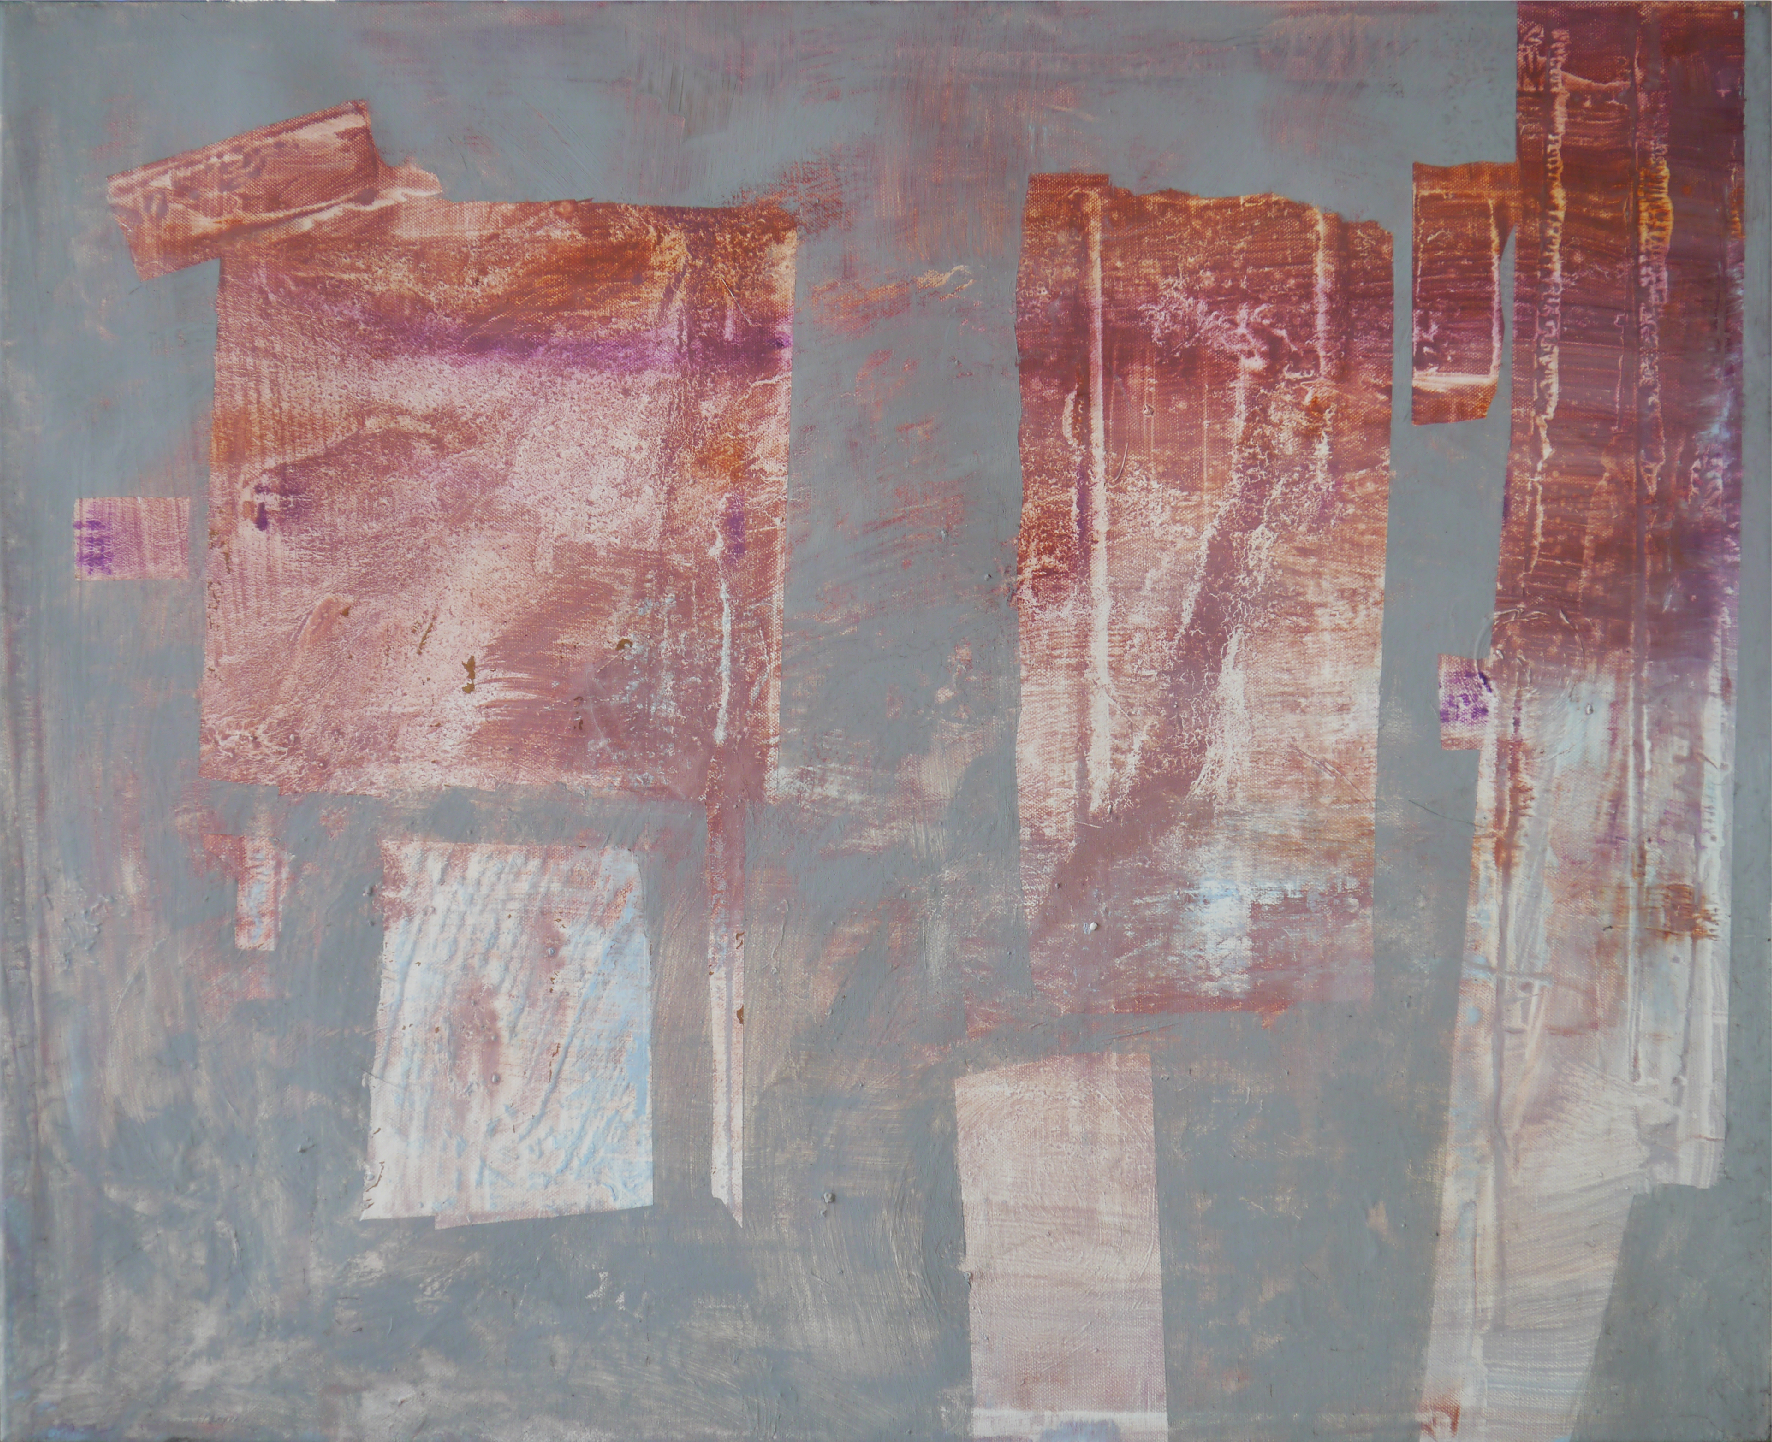 Painting_oils_60_80cm_NoTitle_Marta Wapiennik_2016.jpg